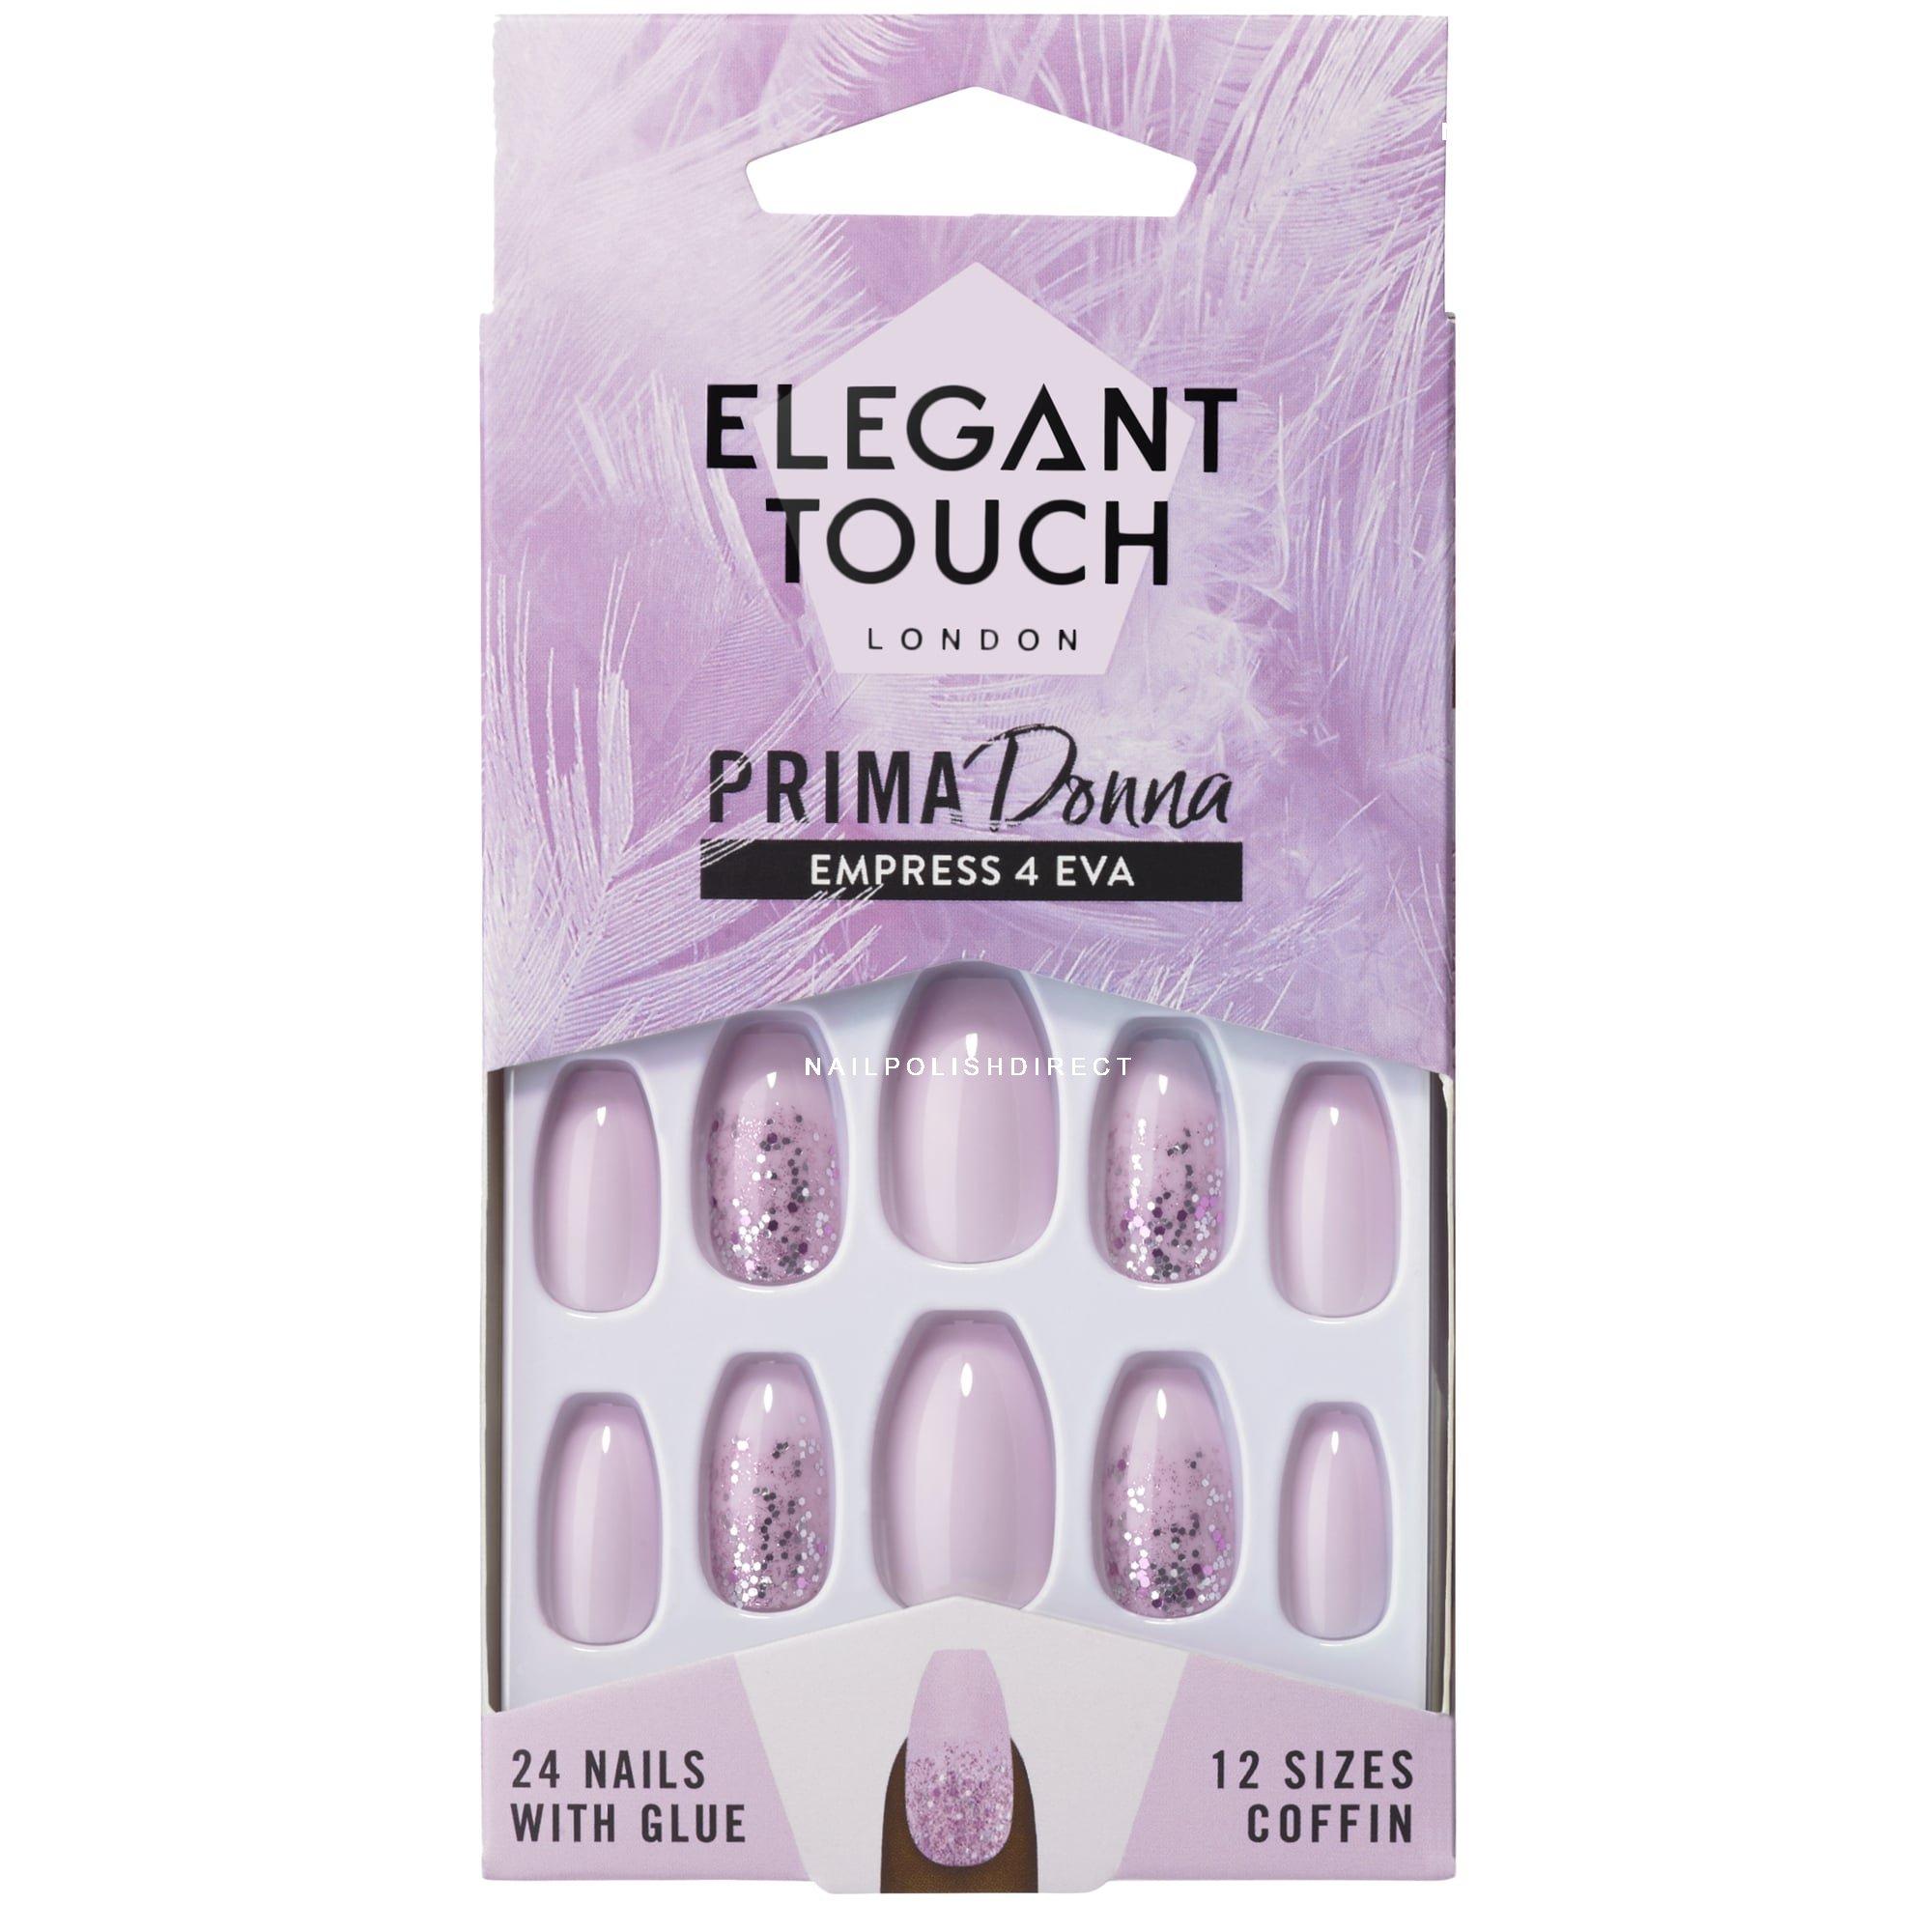 Elegant Touch - Prima Donna Nail Collection - Empress 4 Eva (24 Nails)